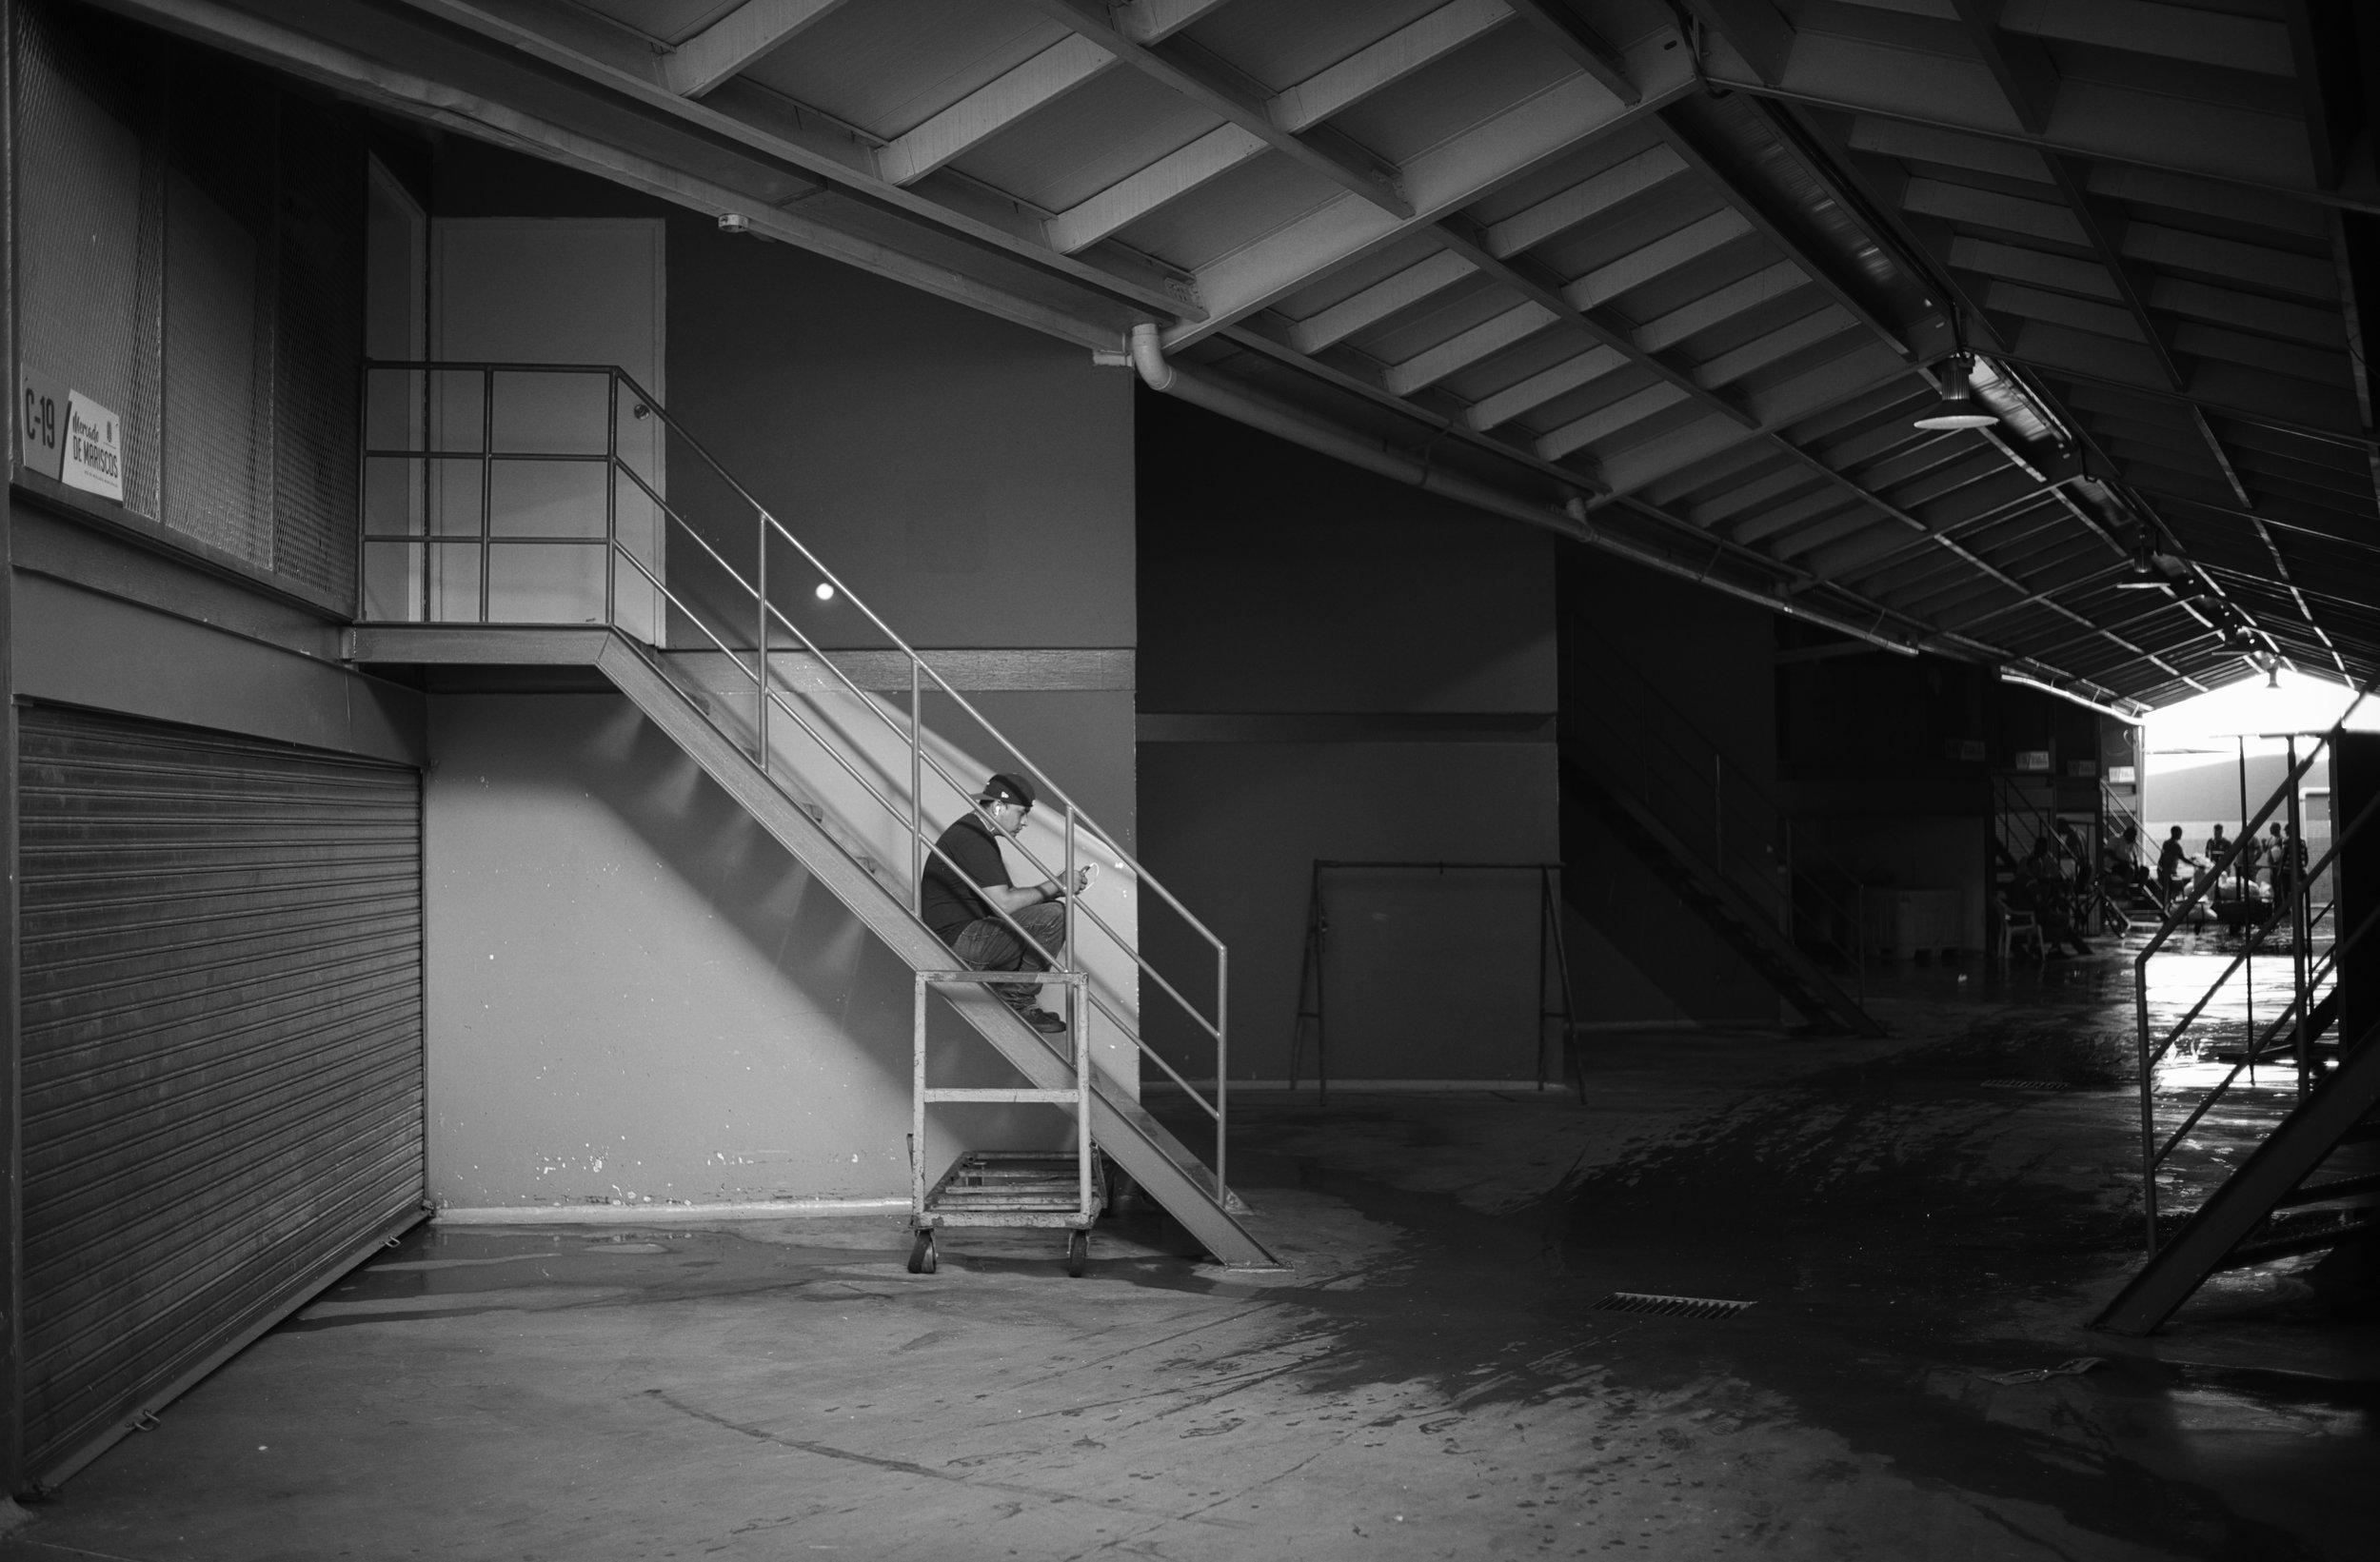 Fish Man Panama City, Panama Leica SL 35mm f/1.4 FLE Summilux © Keith R. Sbiral, 2018